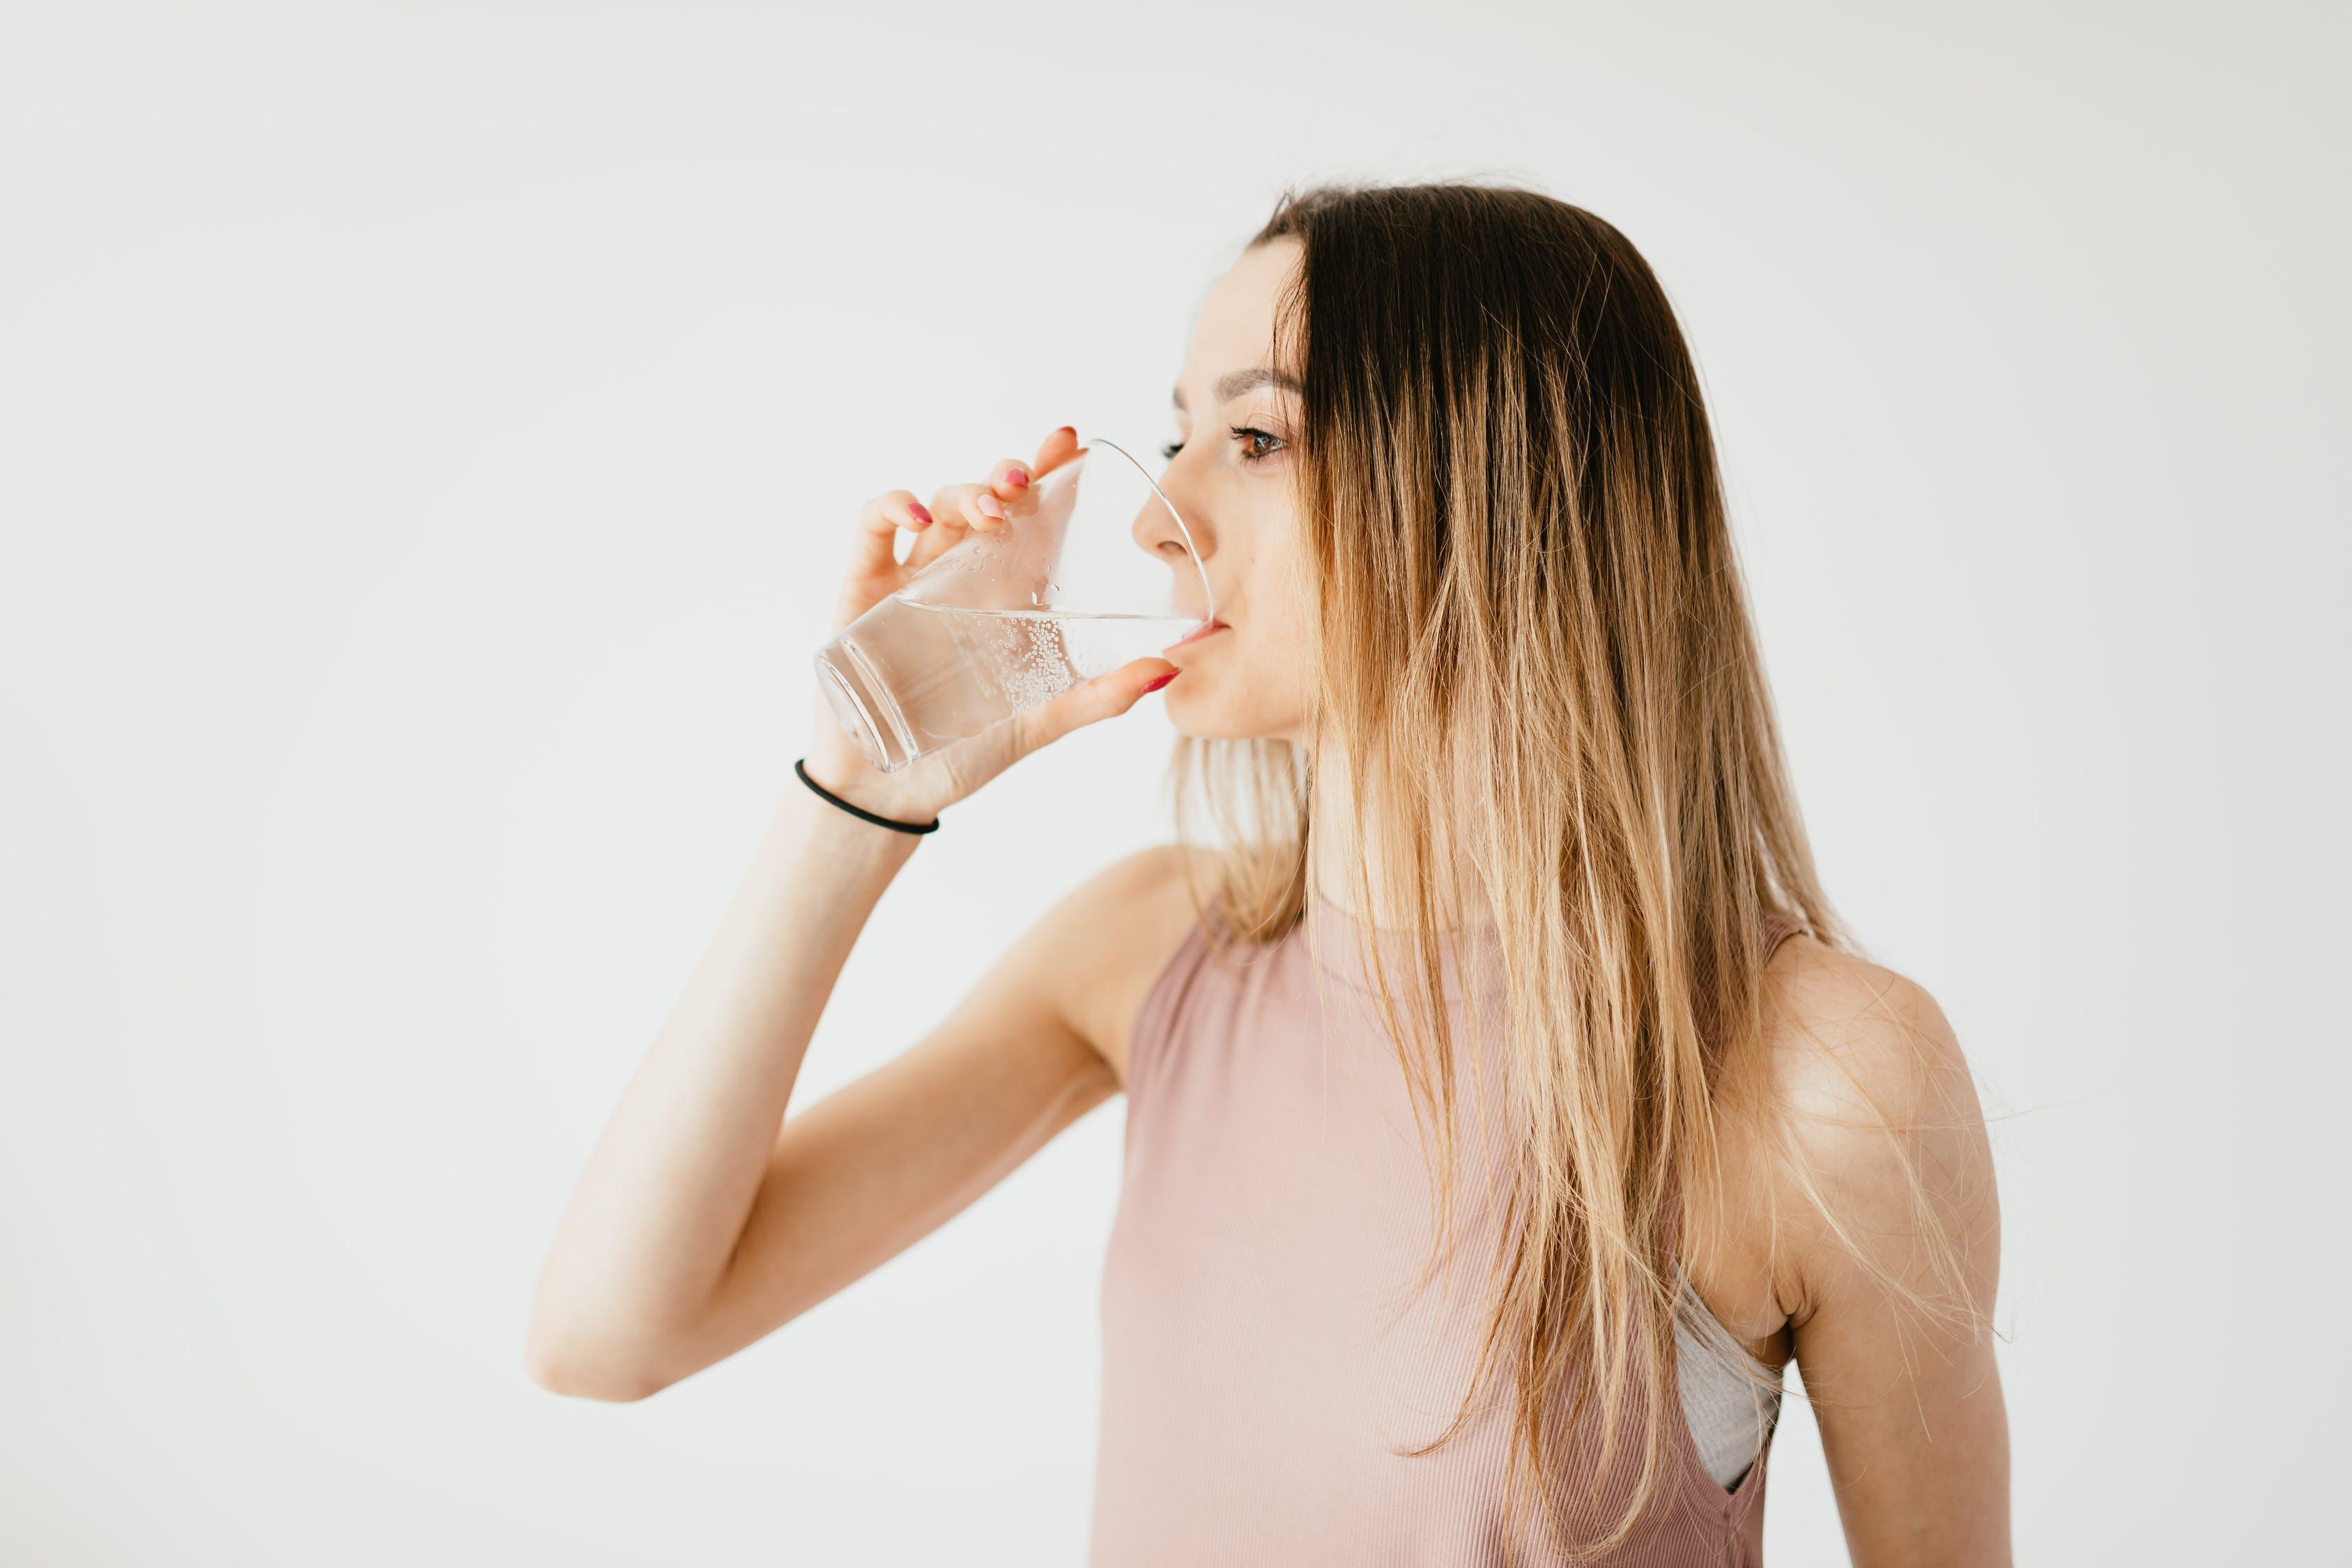 tomar agua en ayunas